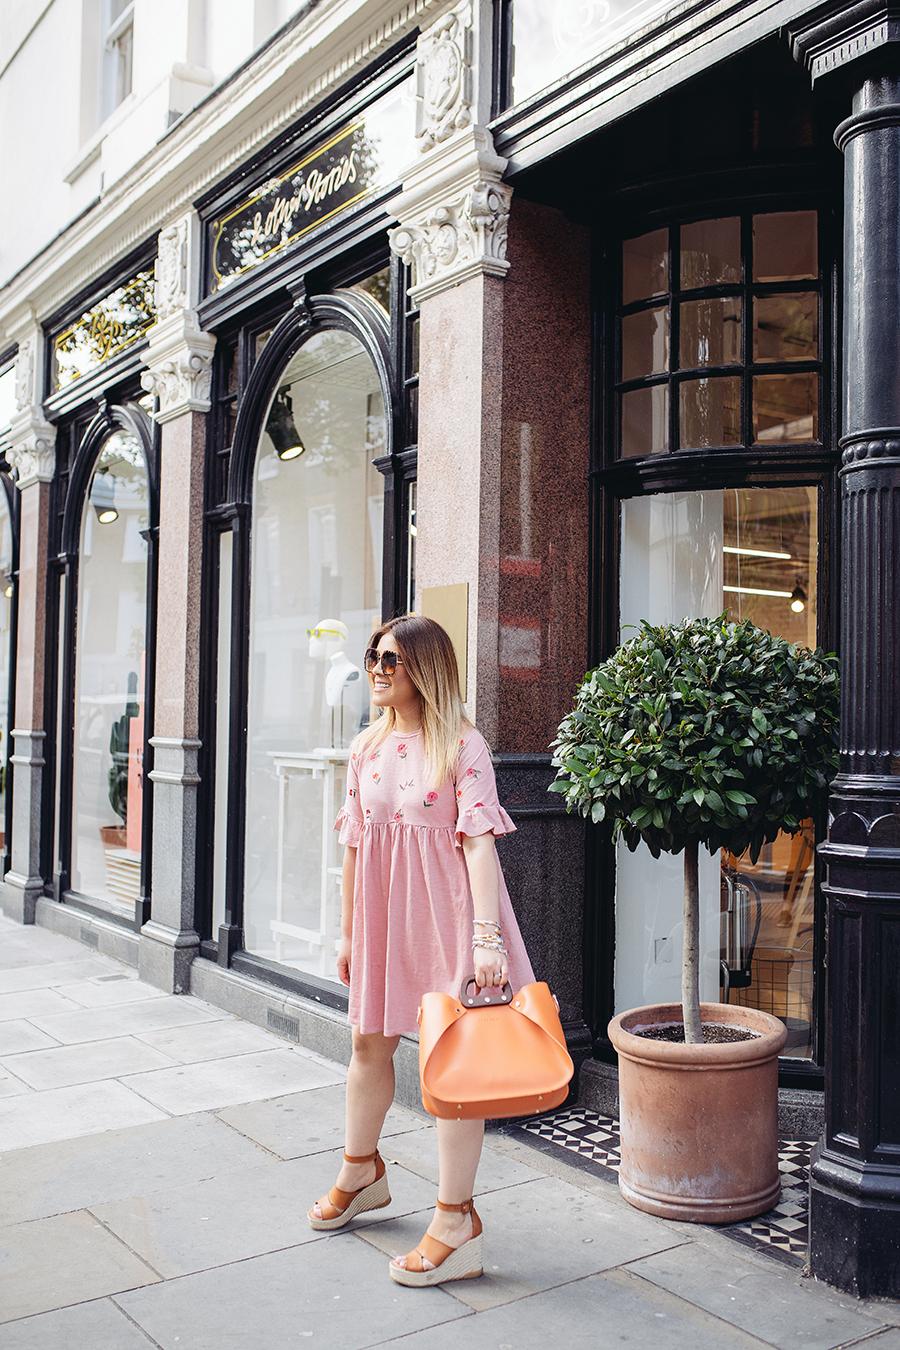 thirty of my no no's. Beautiful pink dress